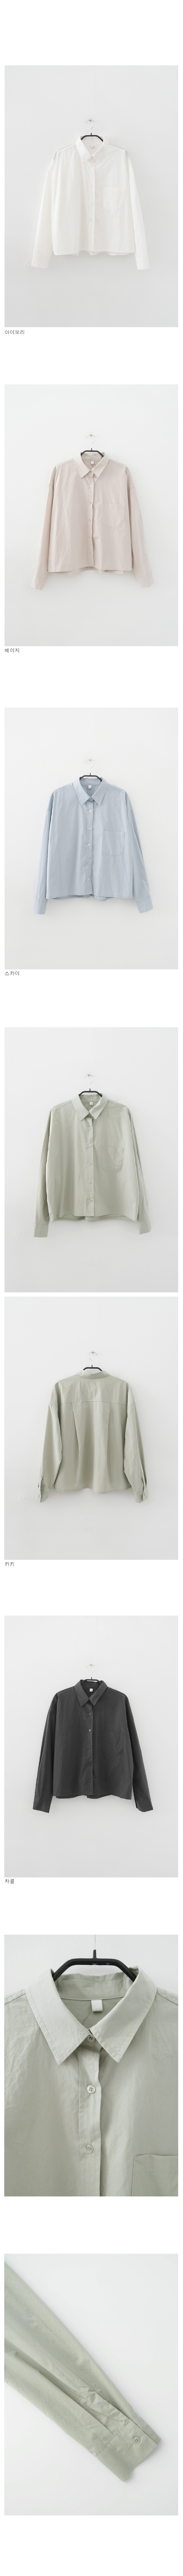 washing cotton crop shirts